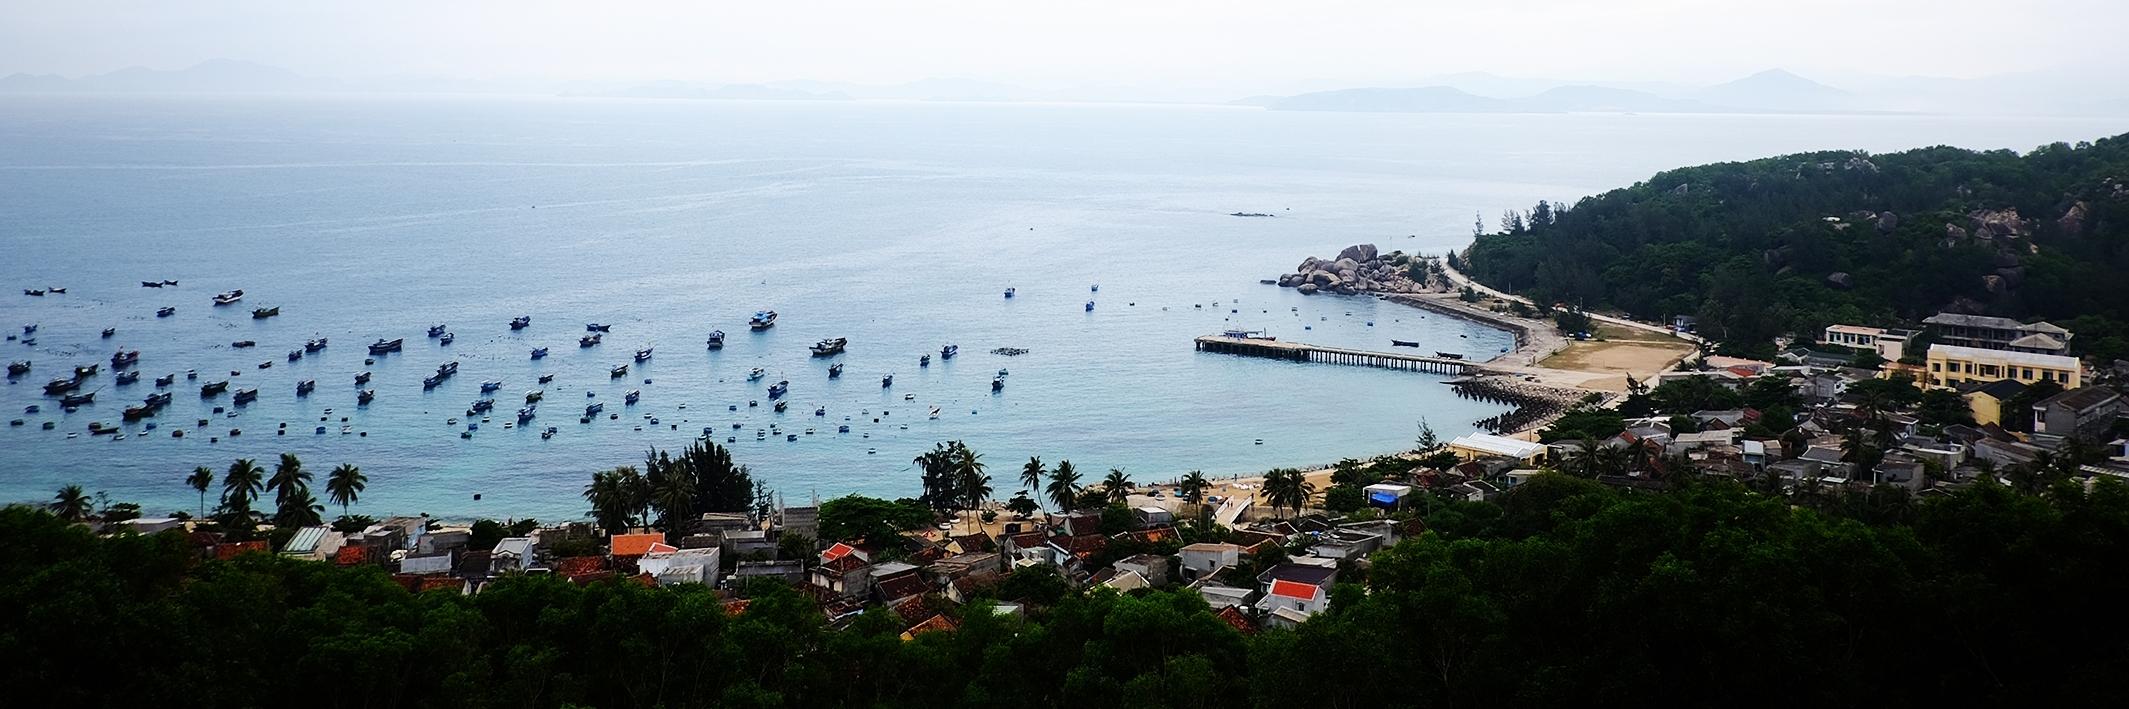 https://gody.vn/blog/nguyentoan02/post/review-sieu-chi-tiet-chuyen-kham-pha-cu-lao-xanh-hon-ngoc-bien-dong-484